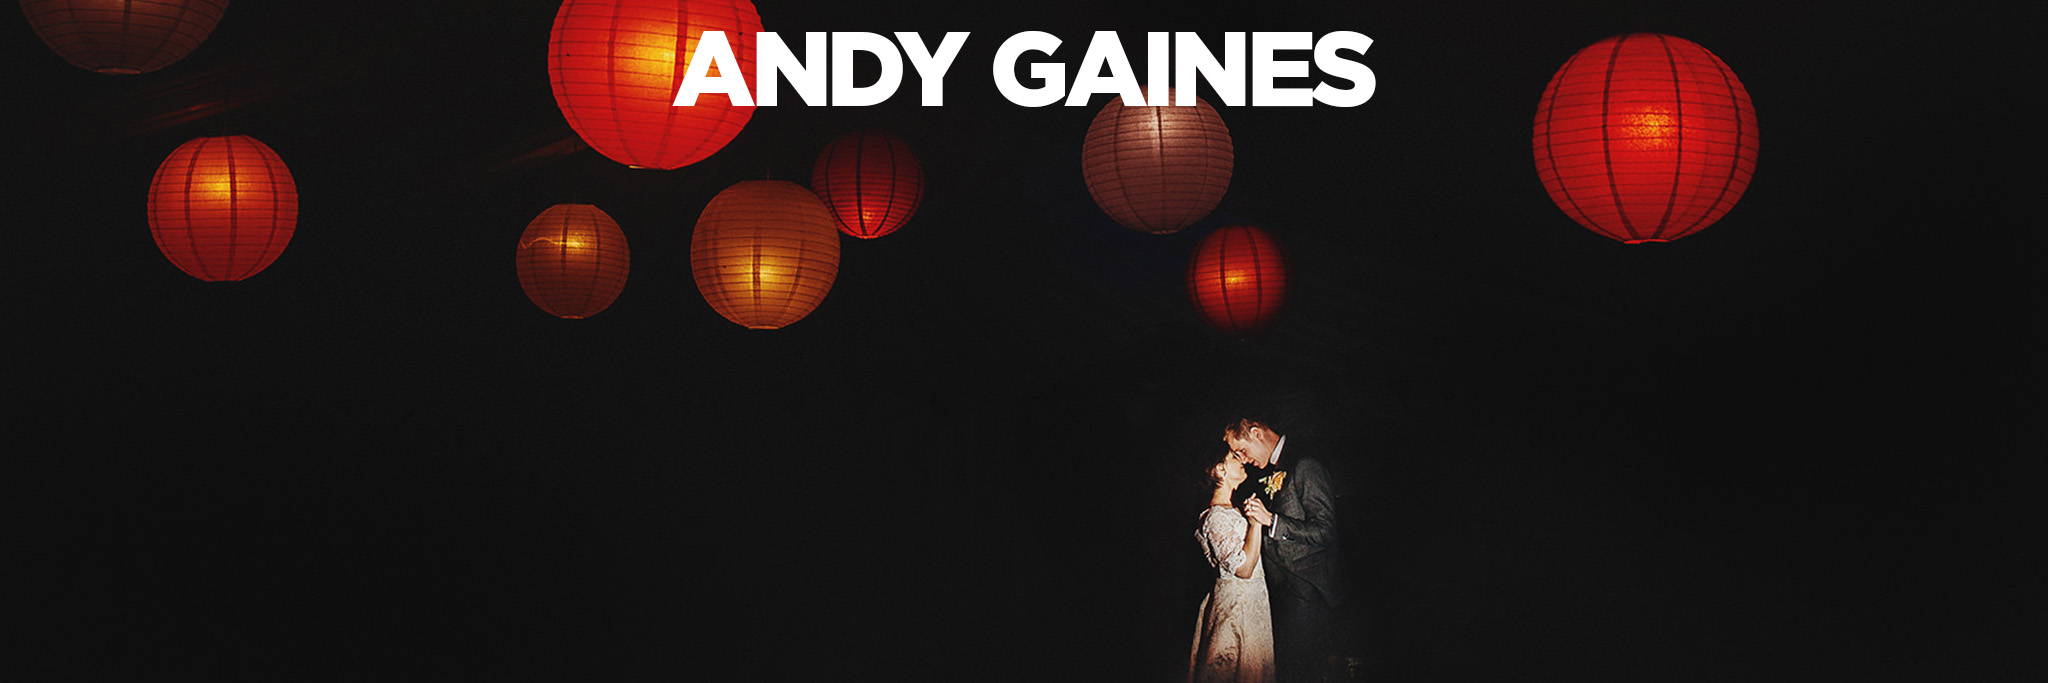 3-andy_gaines.jpg